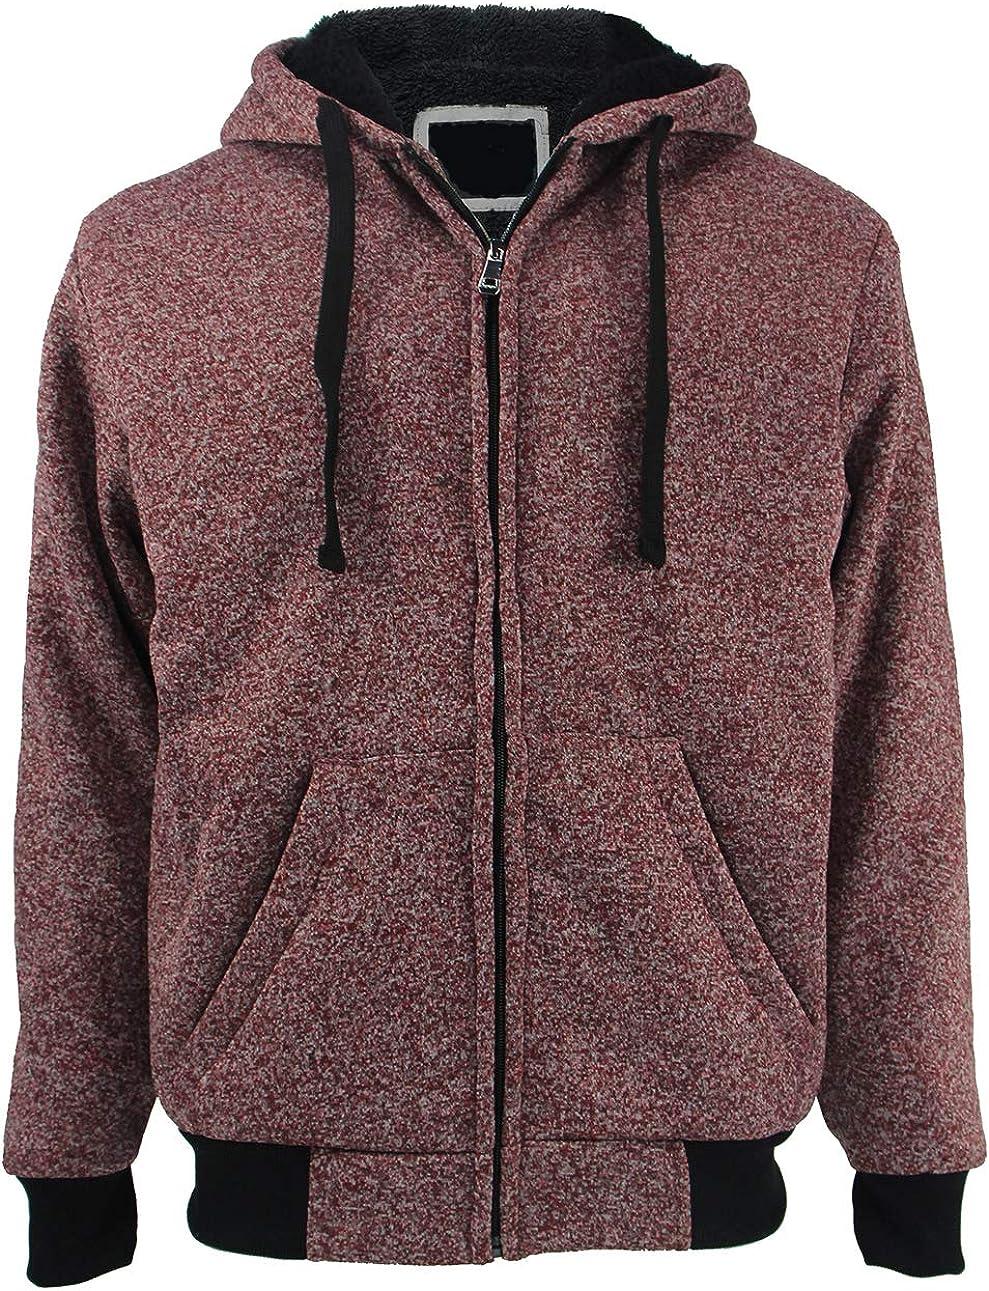 Men's Hoodies Full Max 72% OFF Zip sold out Sherpa Swea Heavyweight Warm Fleece Lined